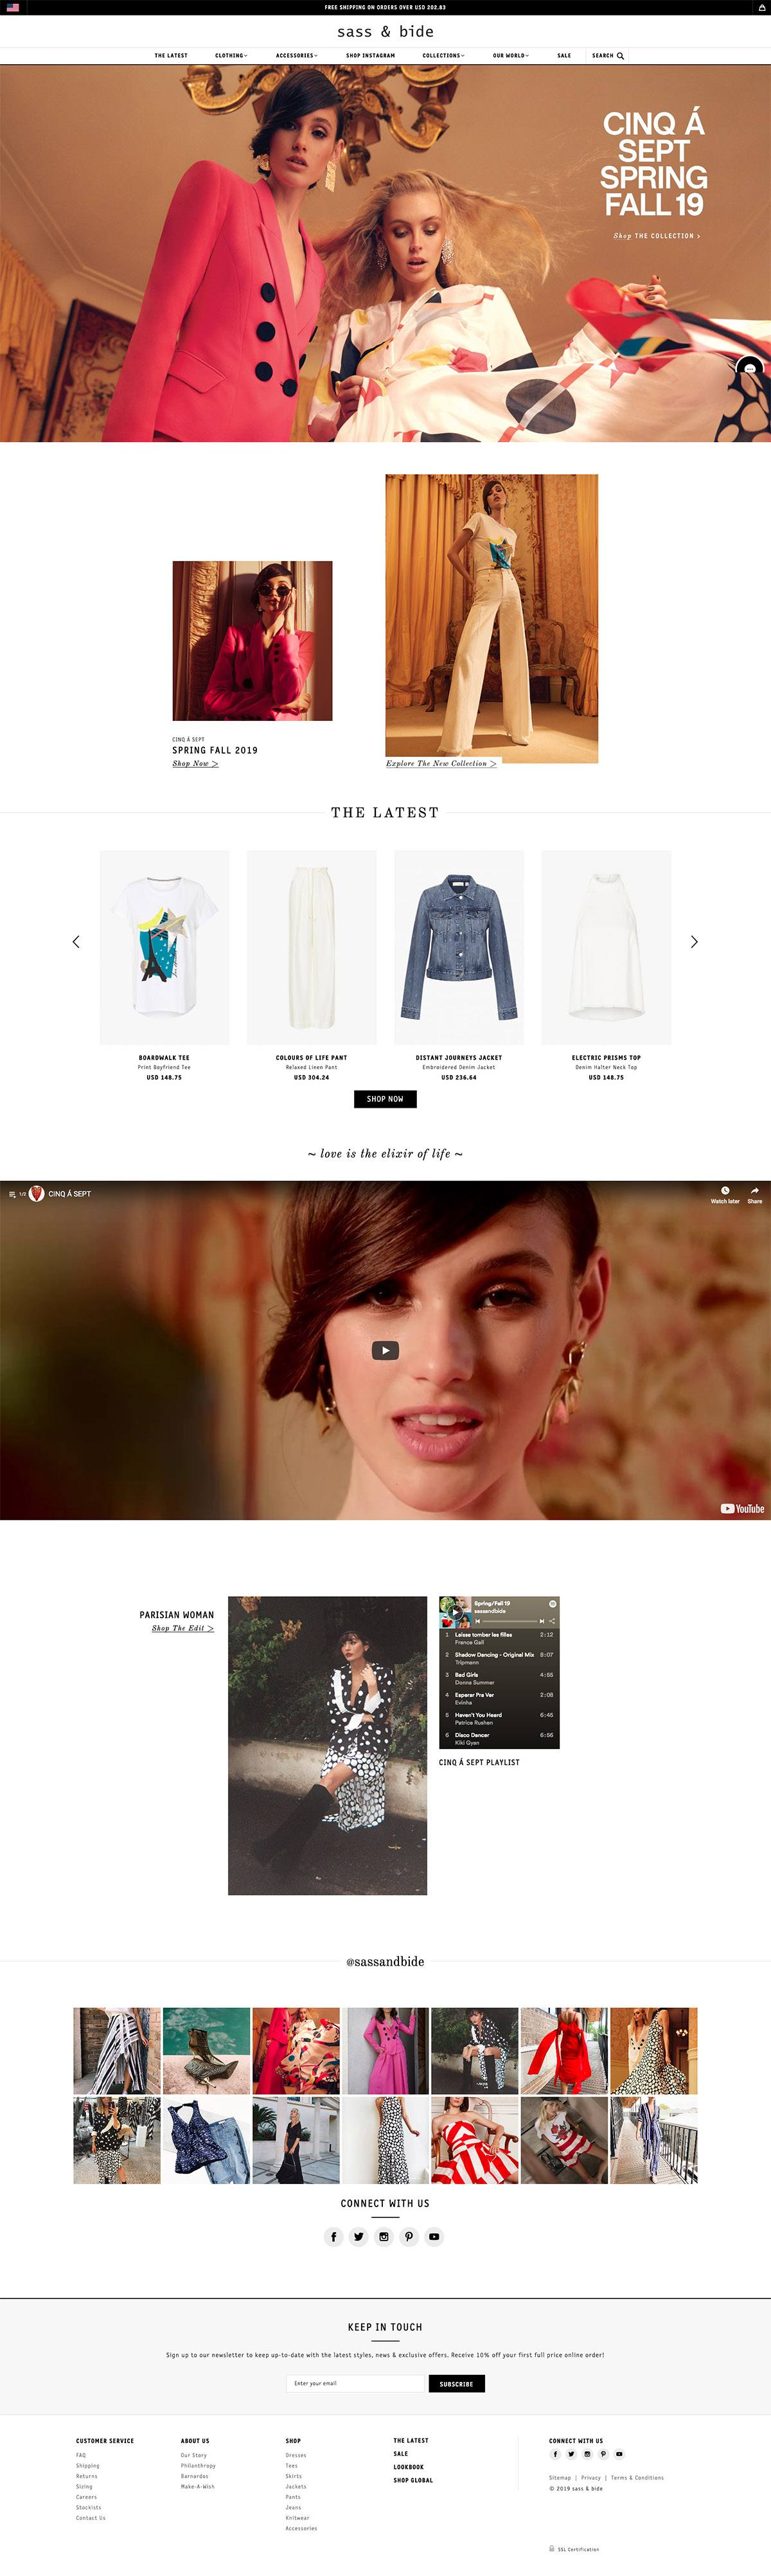 eCommerce website: sass & bide